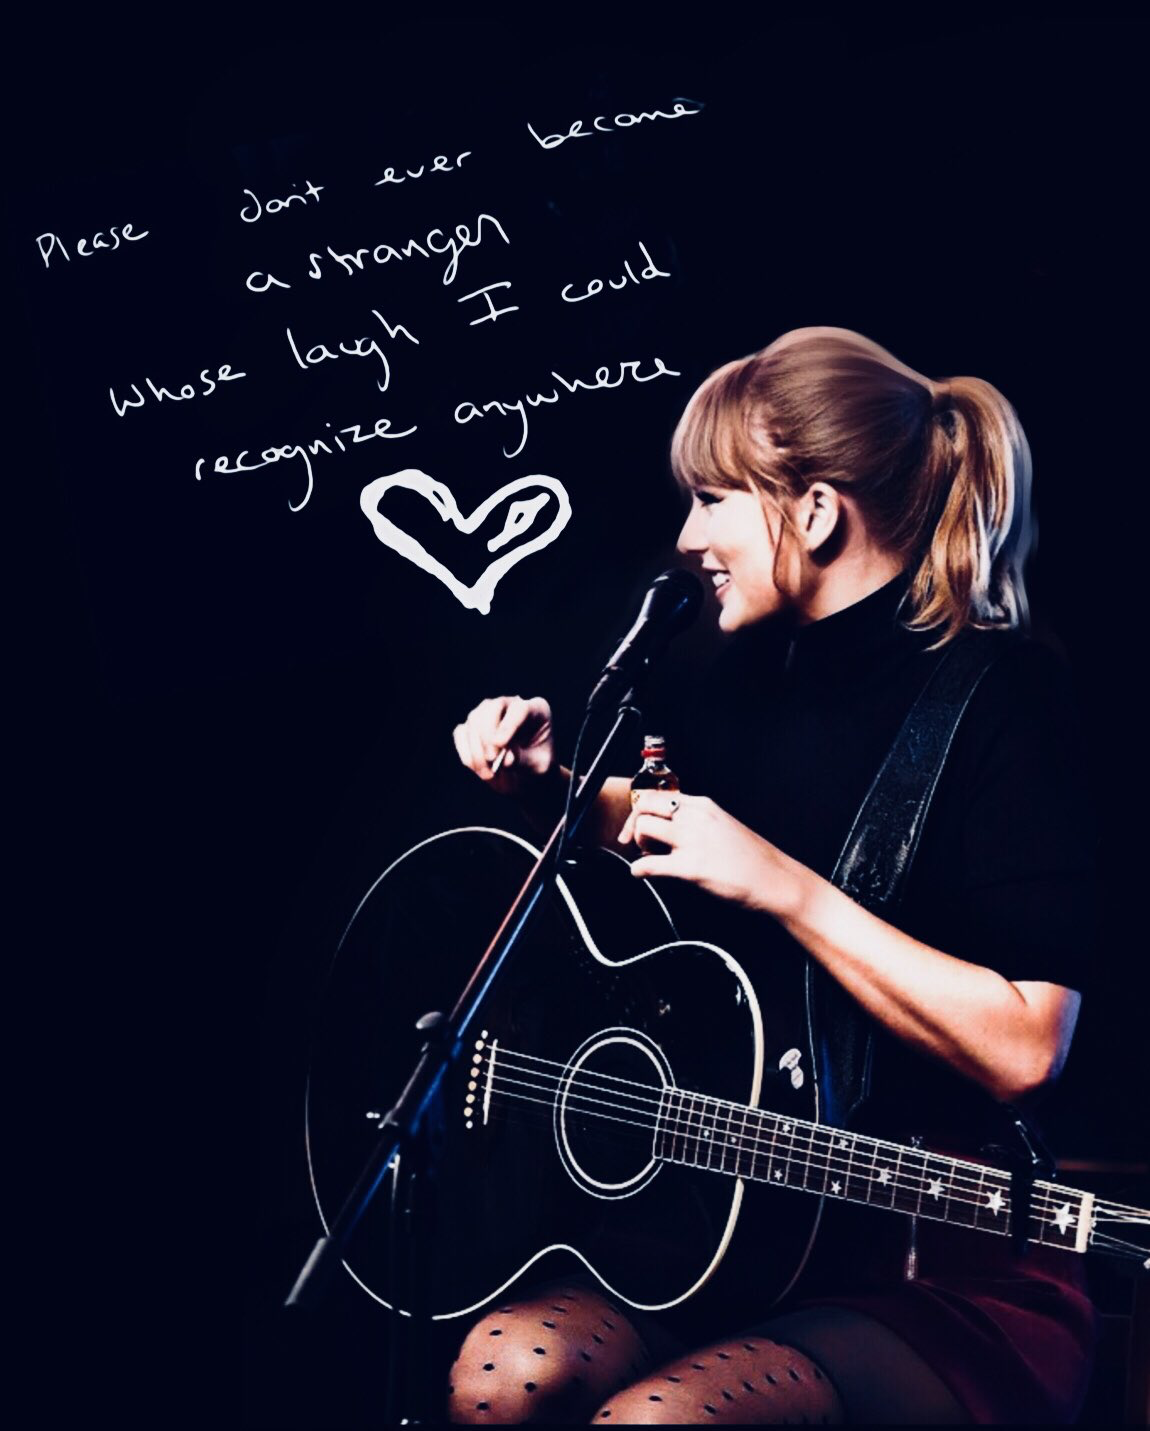 Taylor Swift New Year's Day fan lyric art edit Tswift